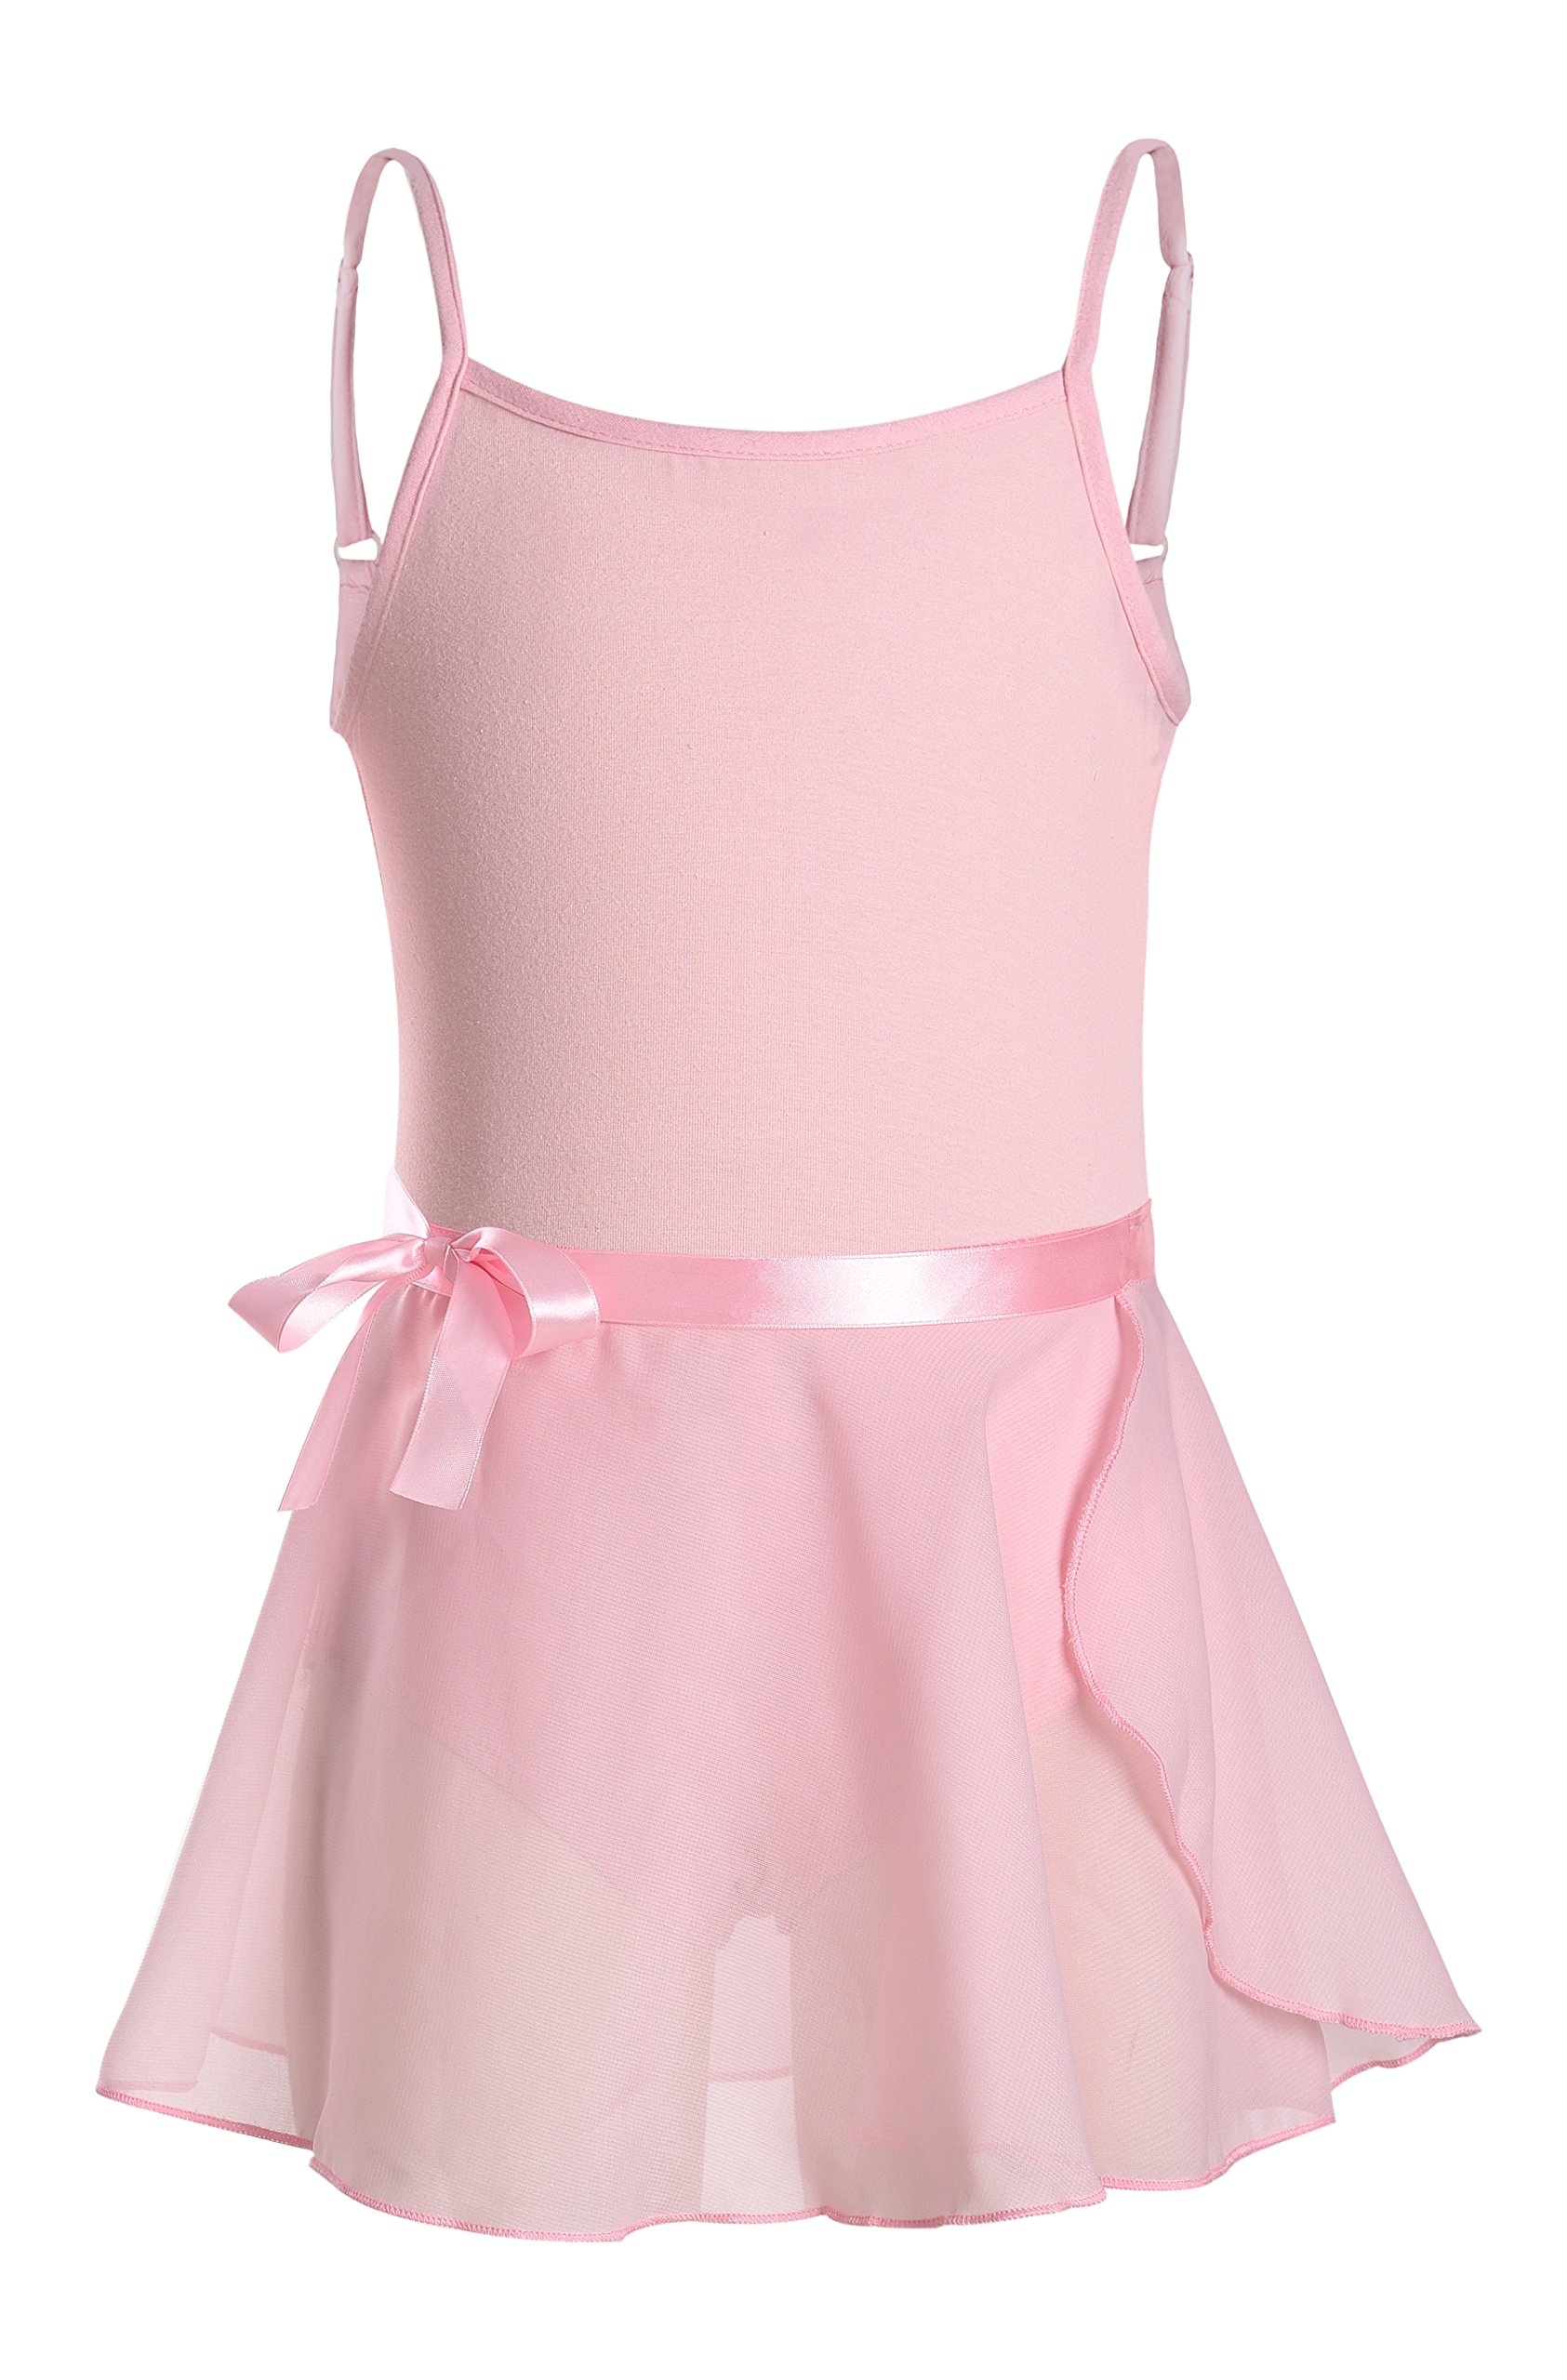 DANSHOW Girls' Camisole Tutu Dress Leotard with Skirt (2-4, Pink)